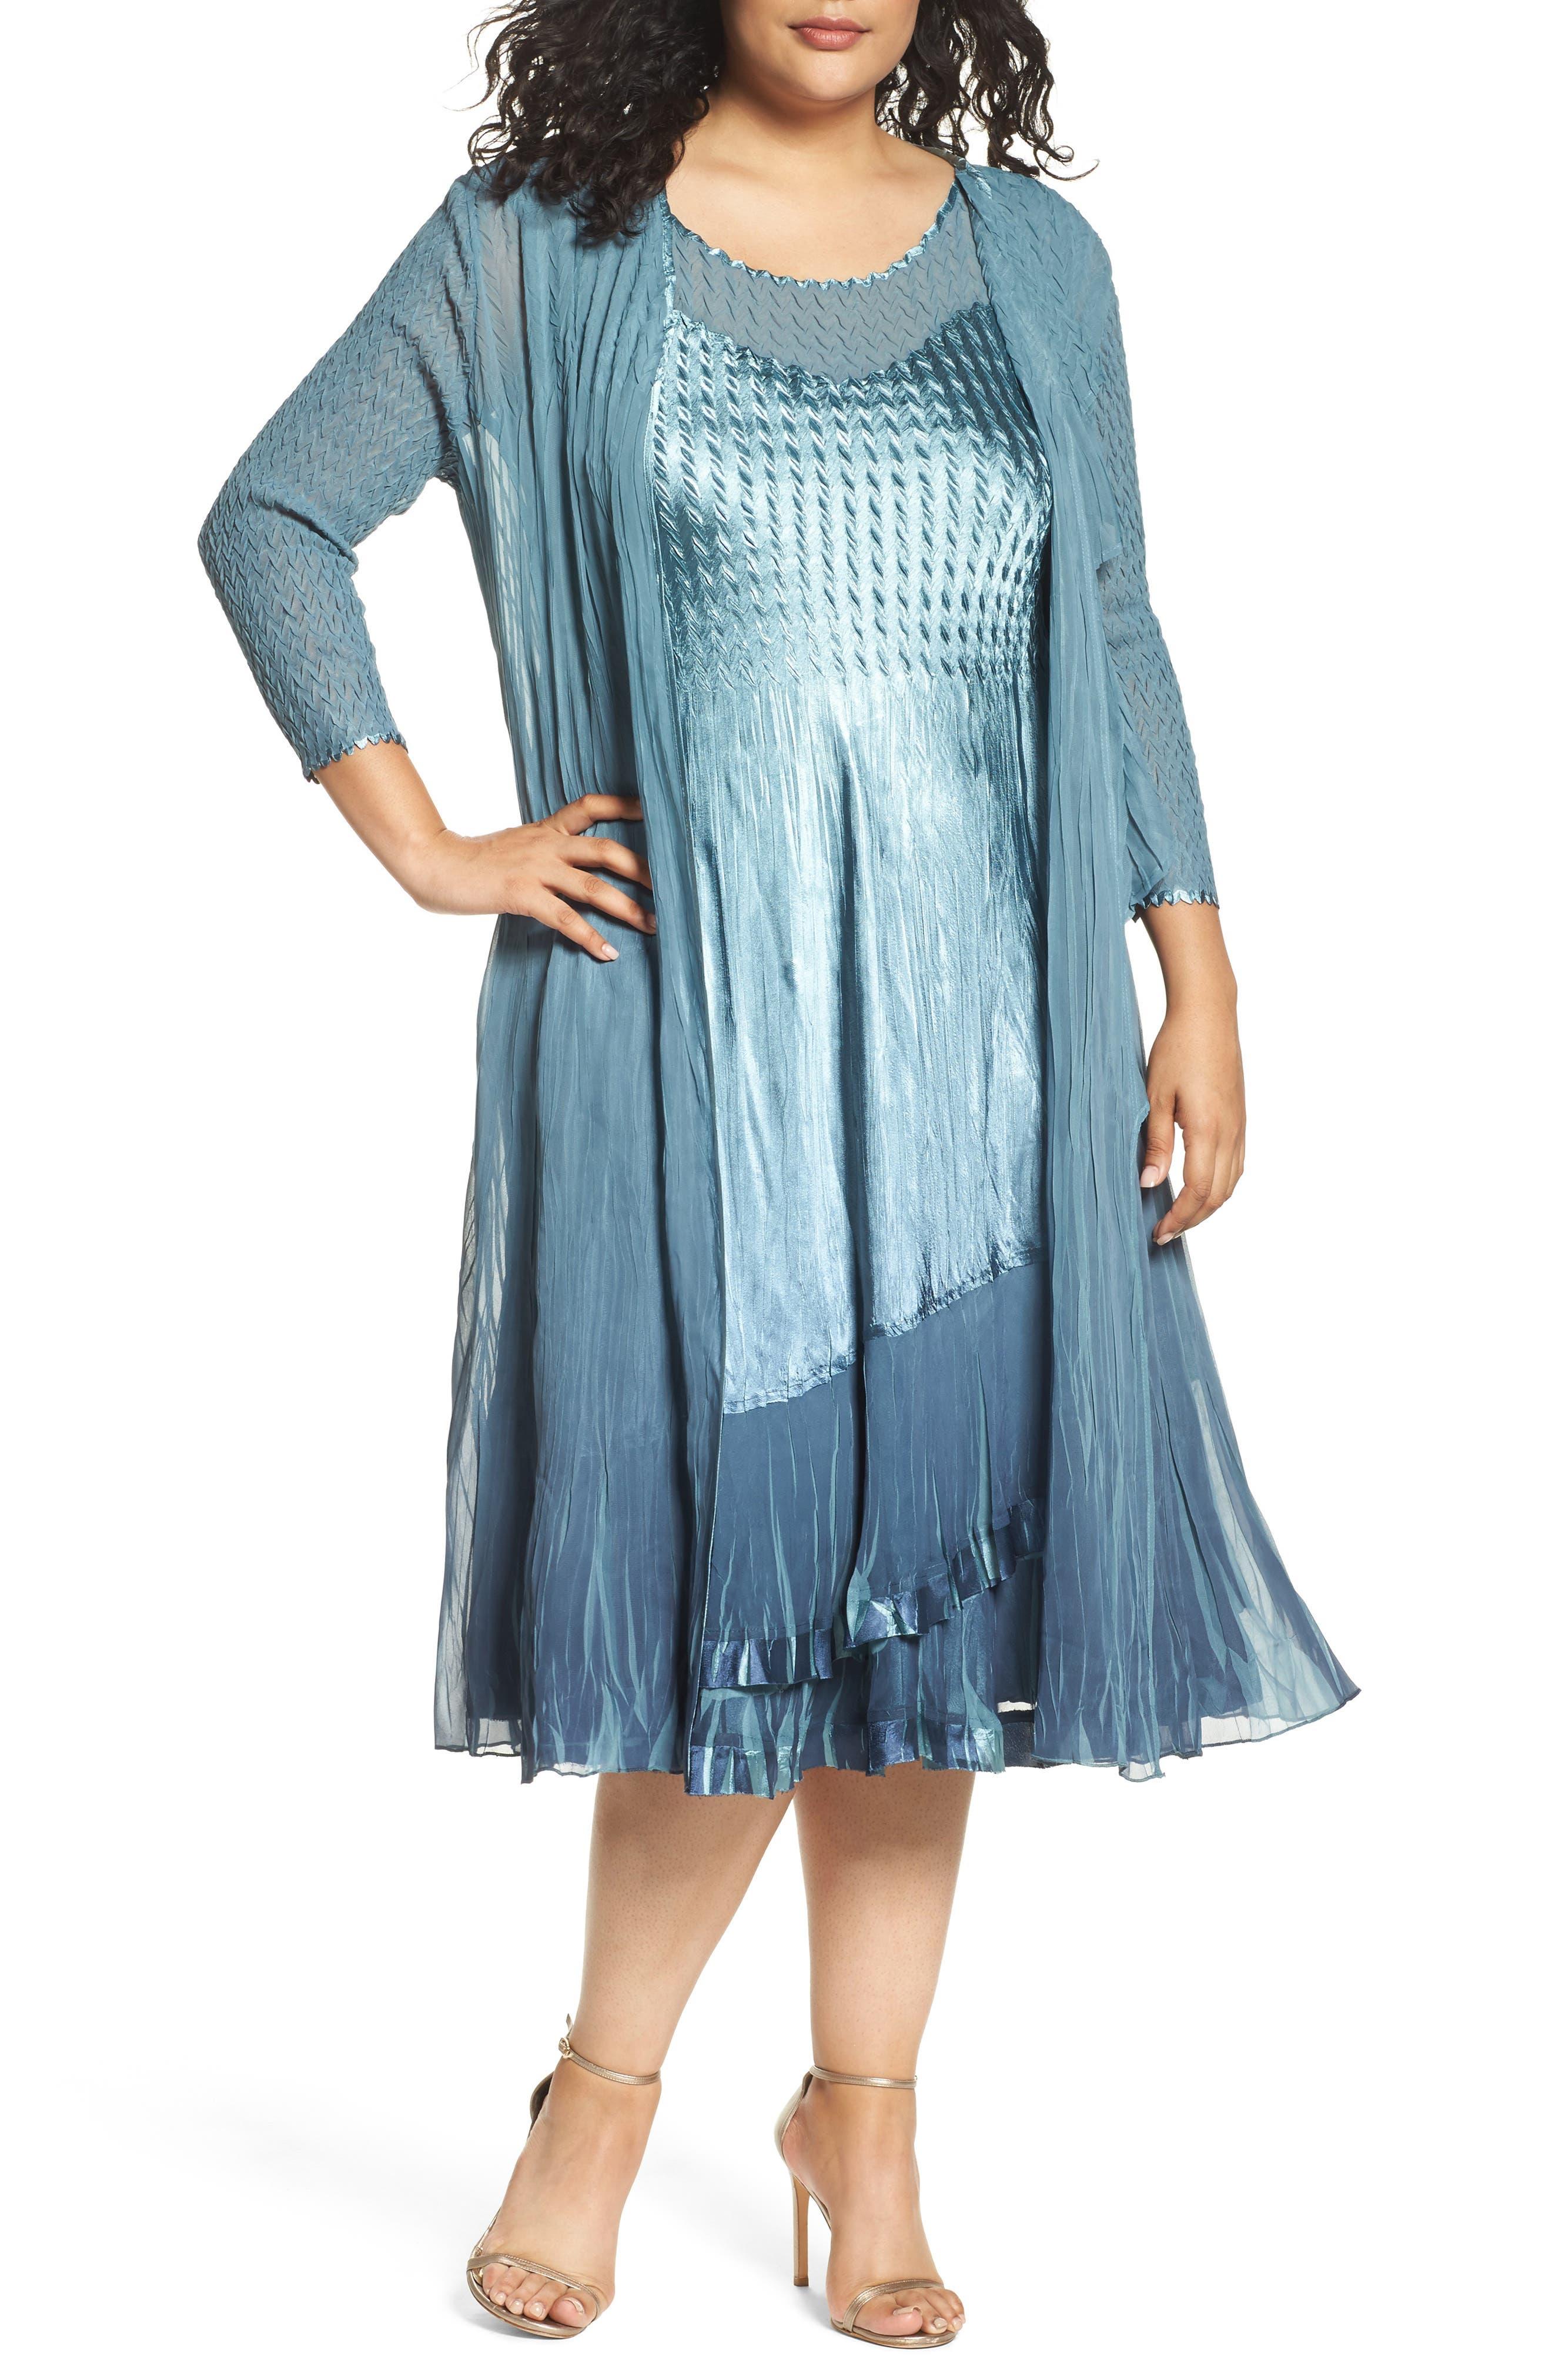 Alternate Image 1 Selected - Komarov Tiered Dress with Jacket (Plus Size)